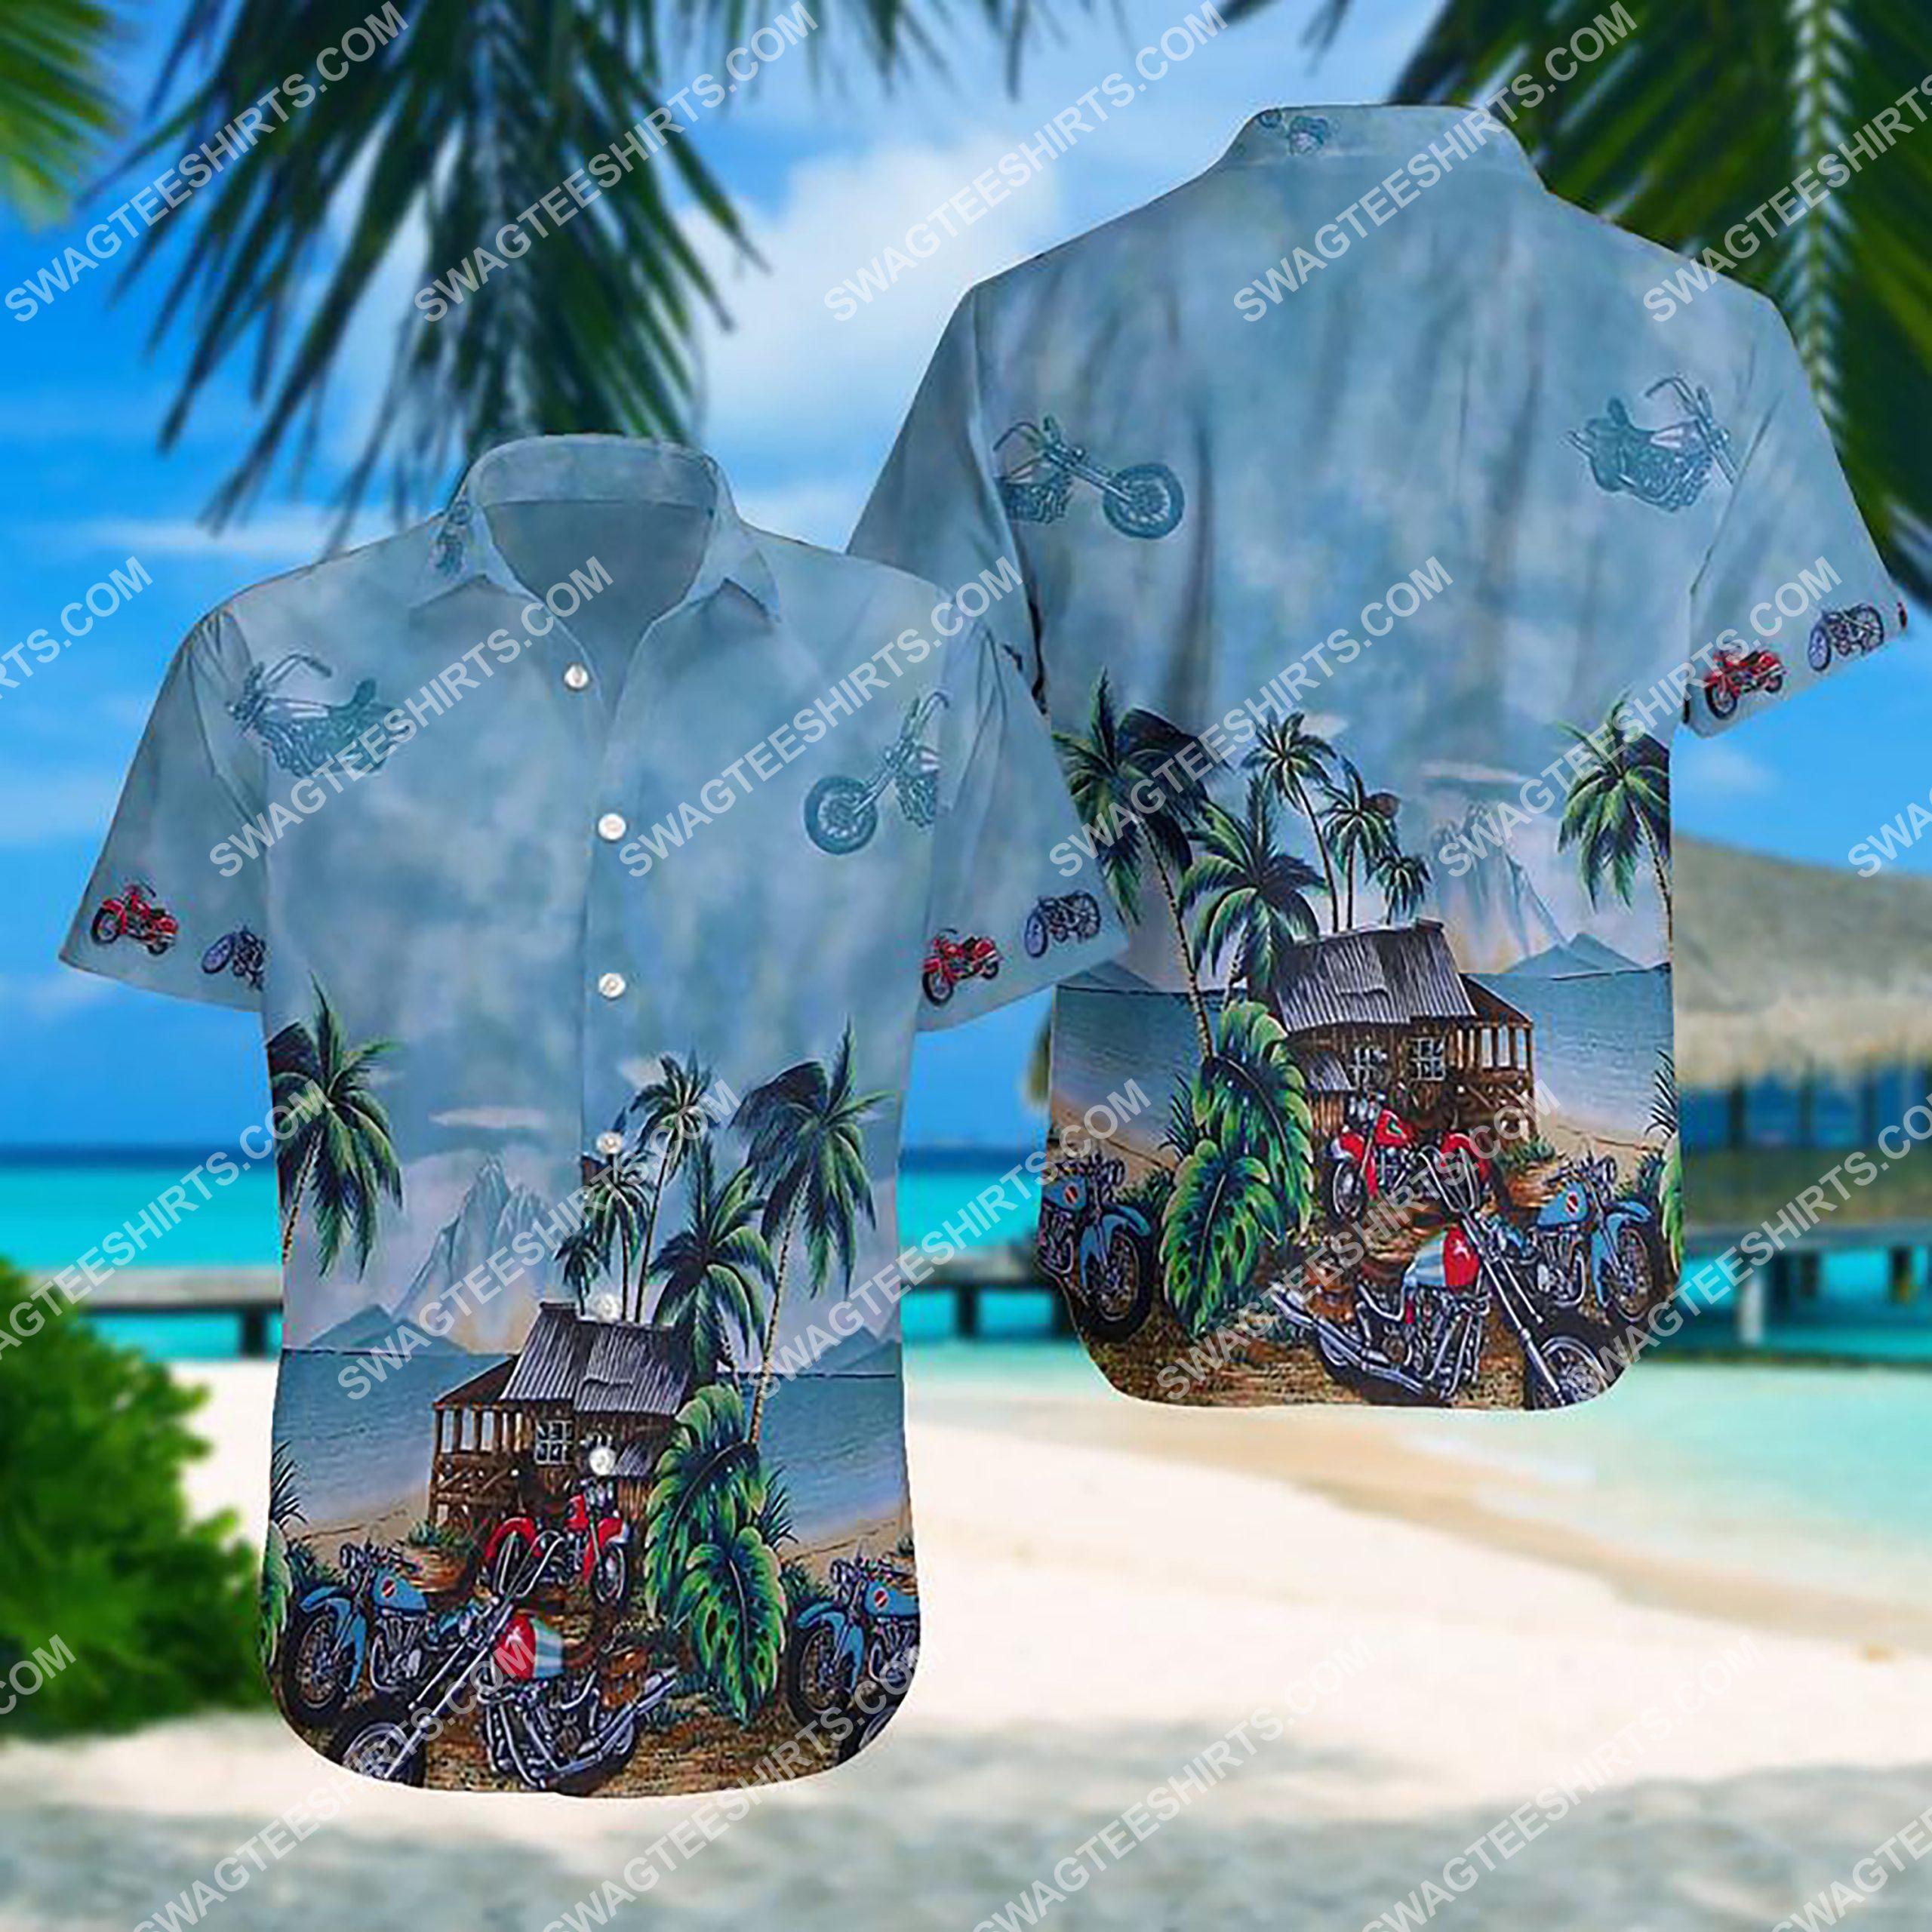 summer time motorcycle all over print hawaiian shirt 3 - Copy